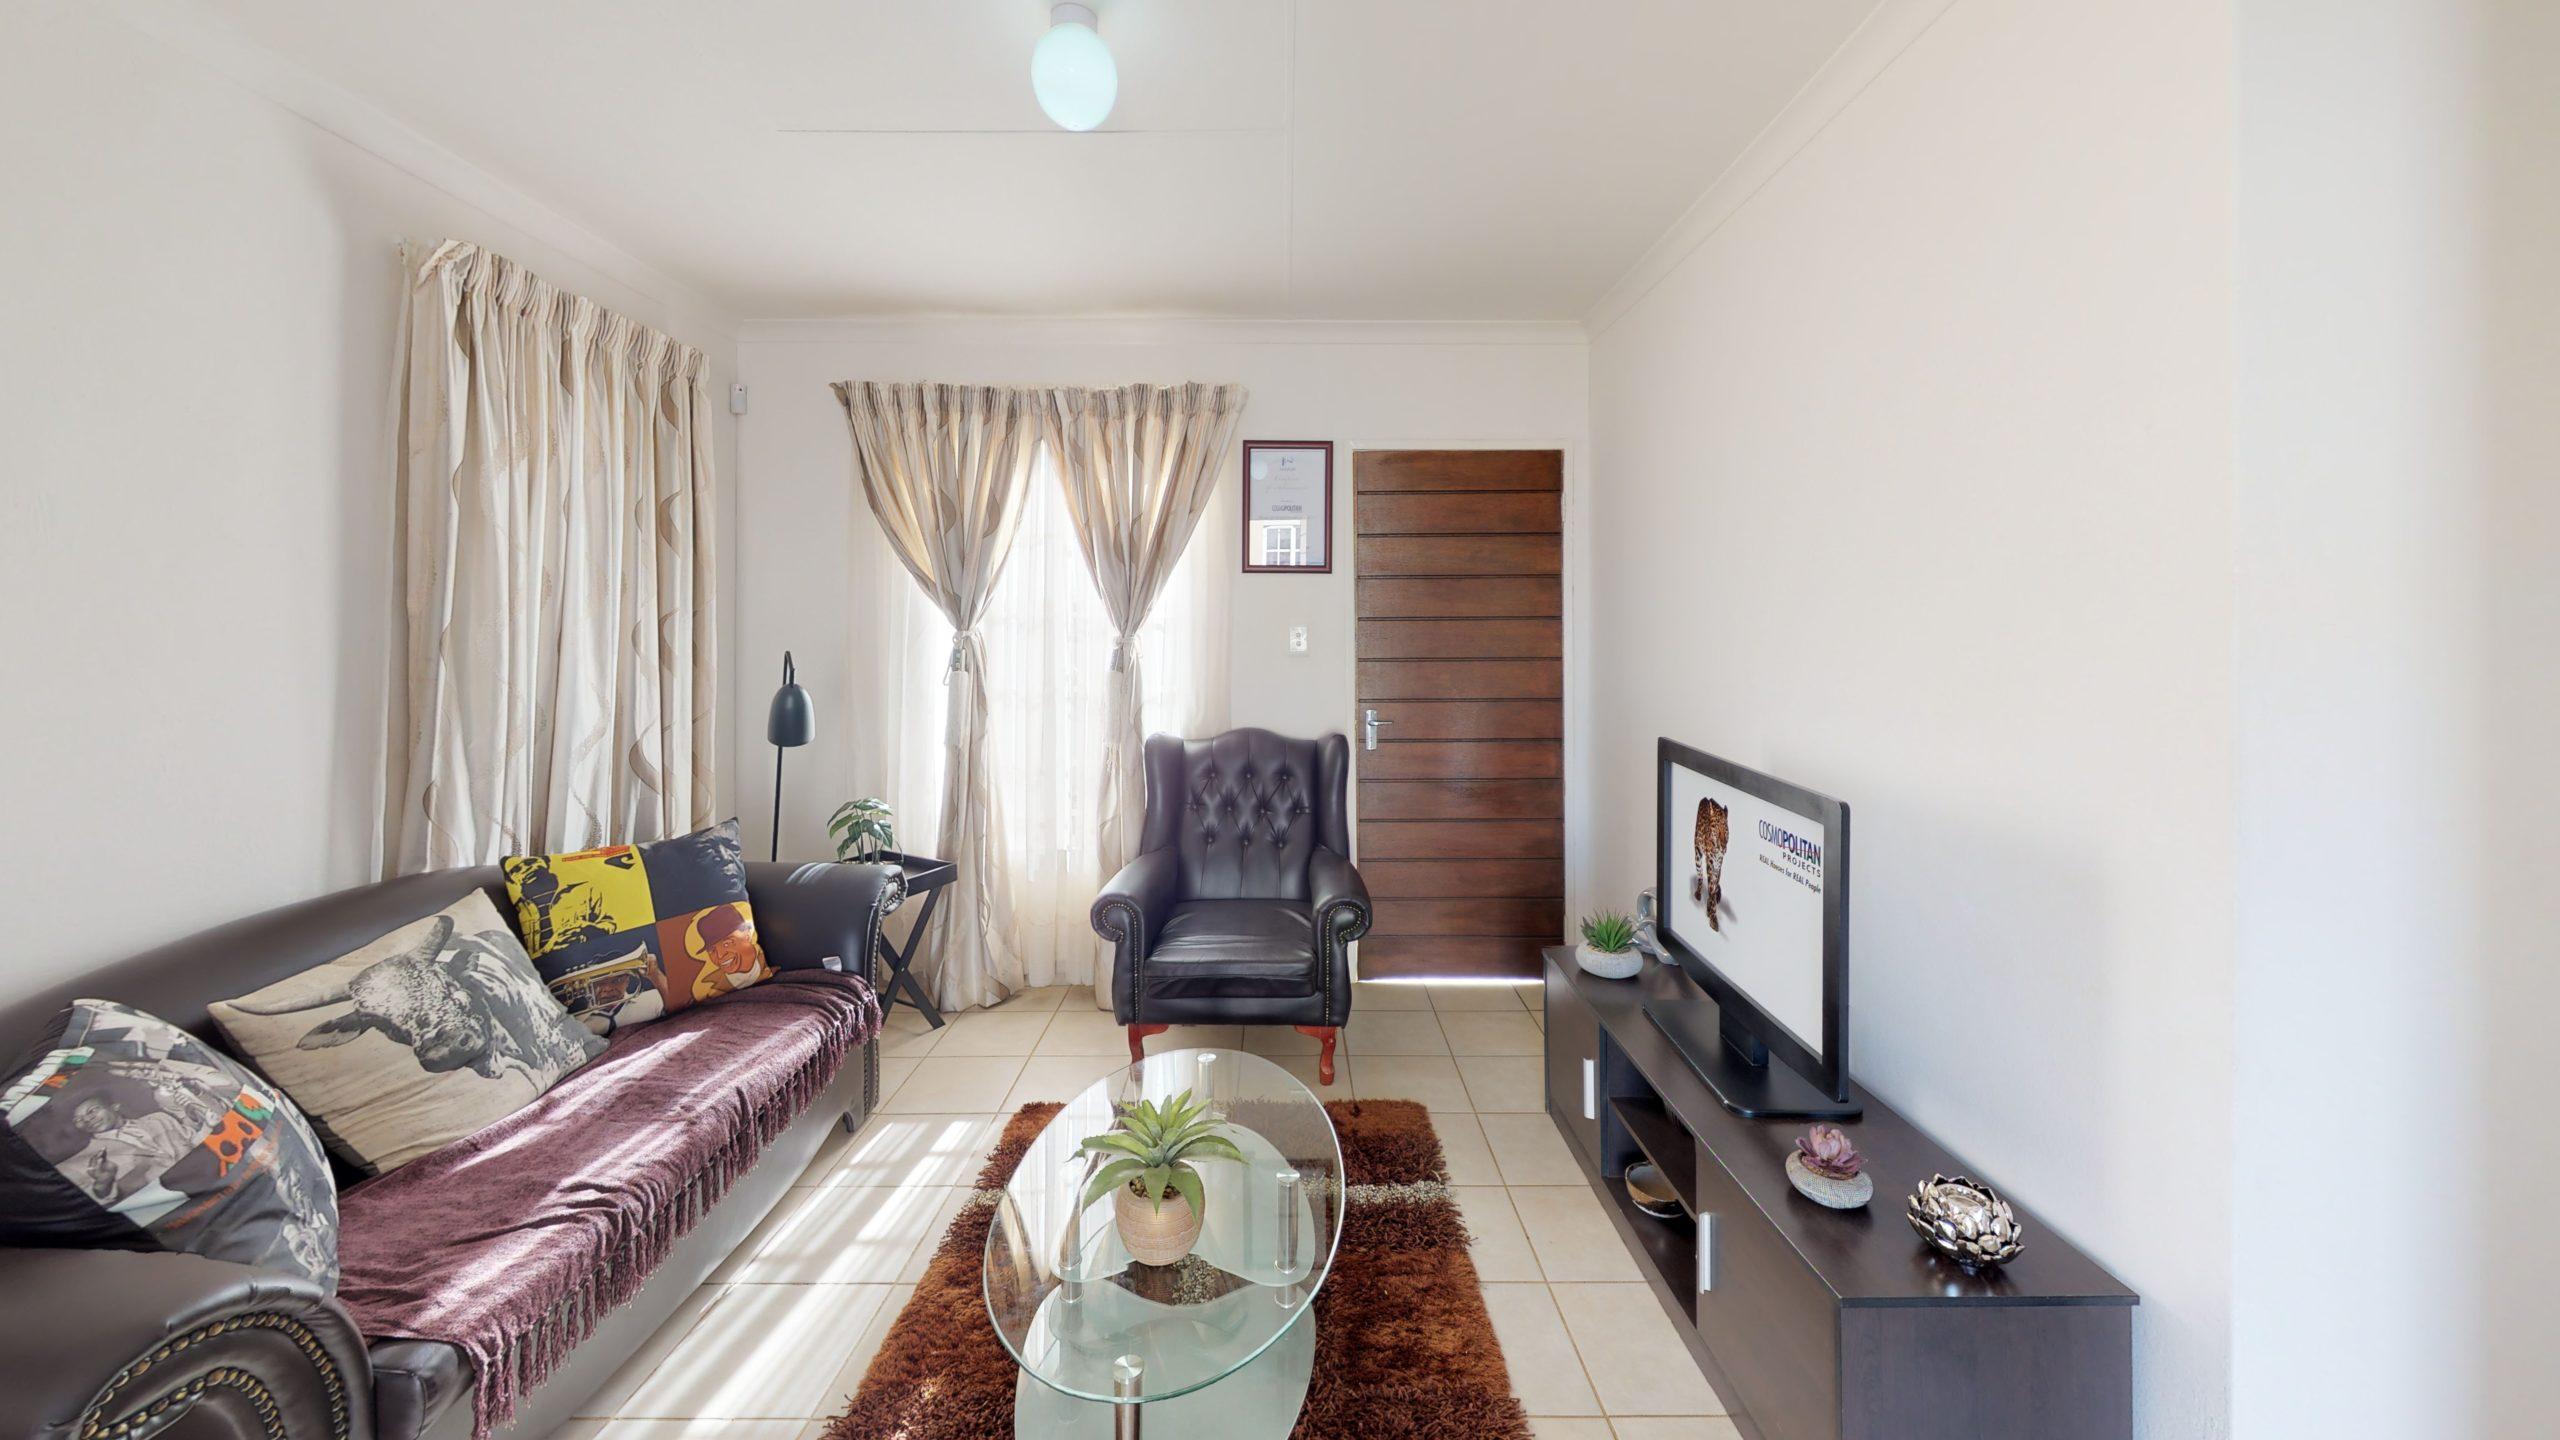 Windmill Park, Homes for Sale in Vosloorus, Gauteng - Lounge